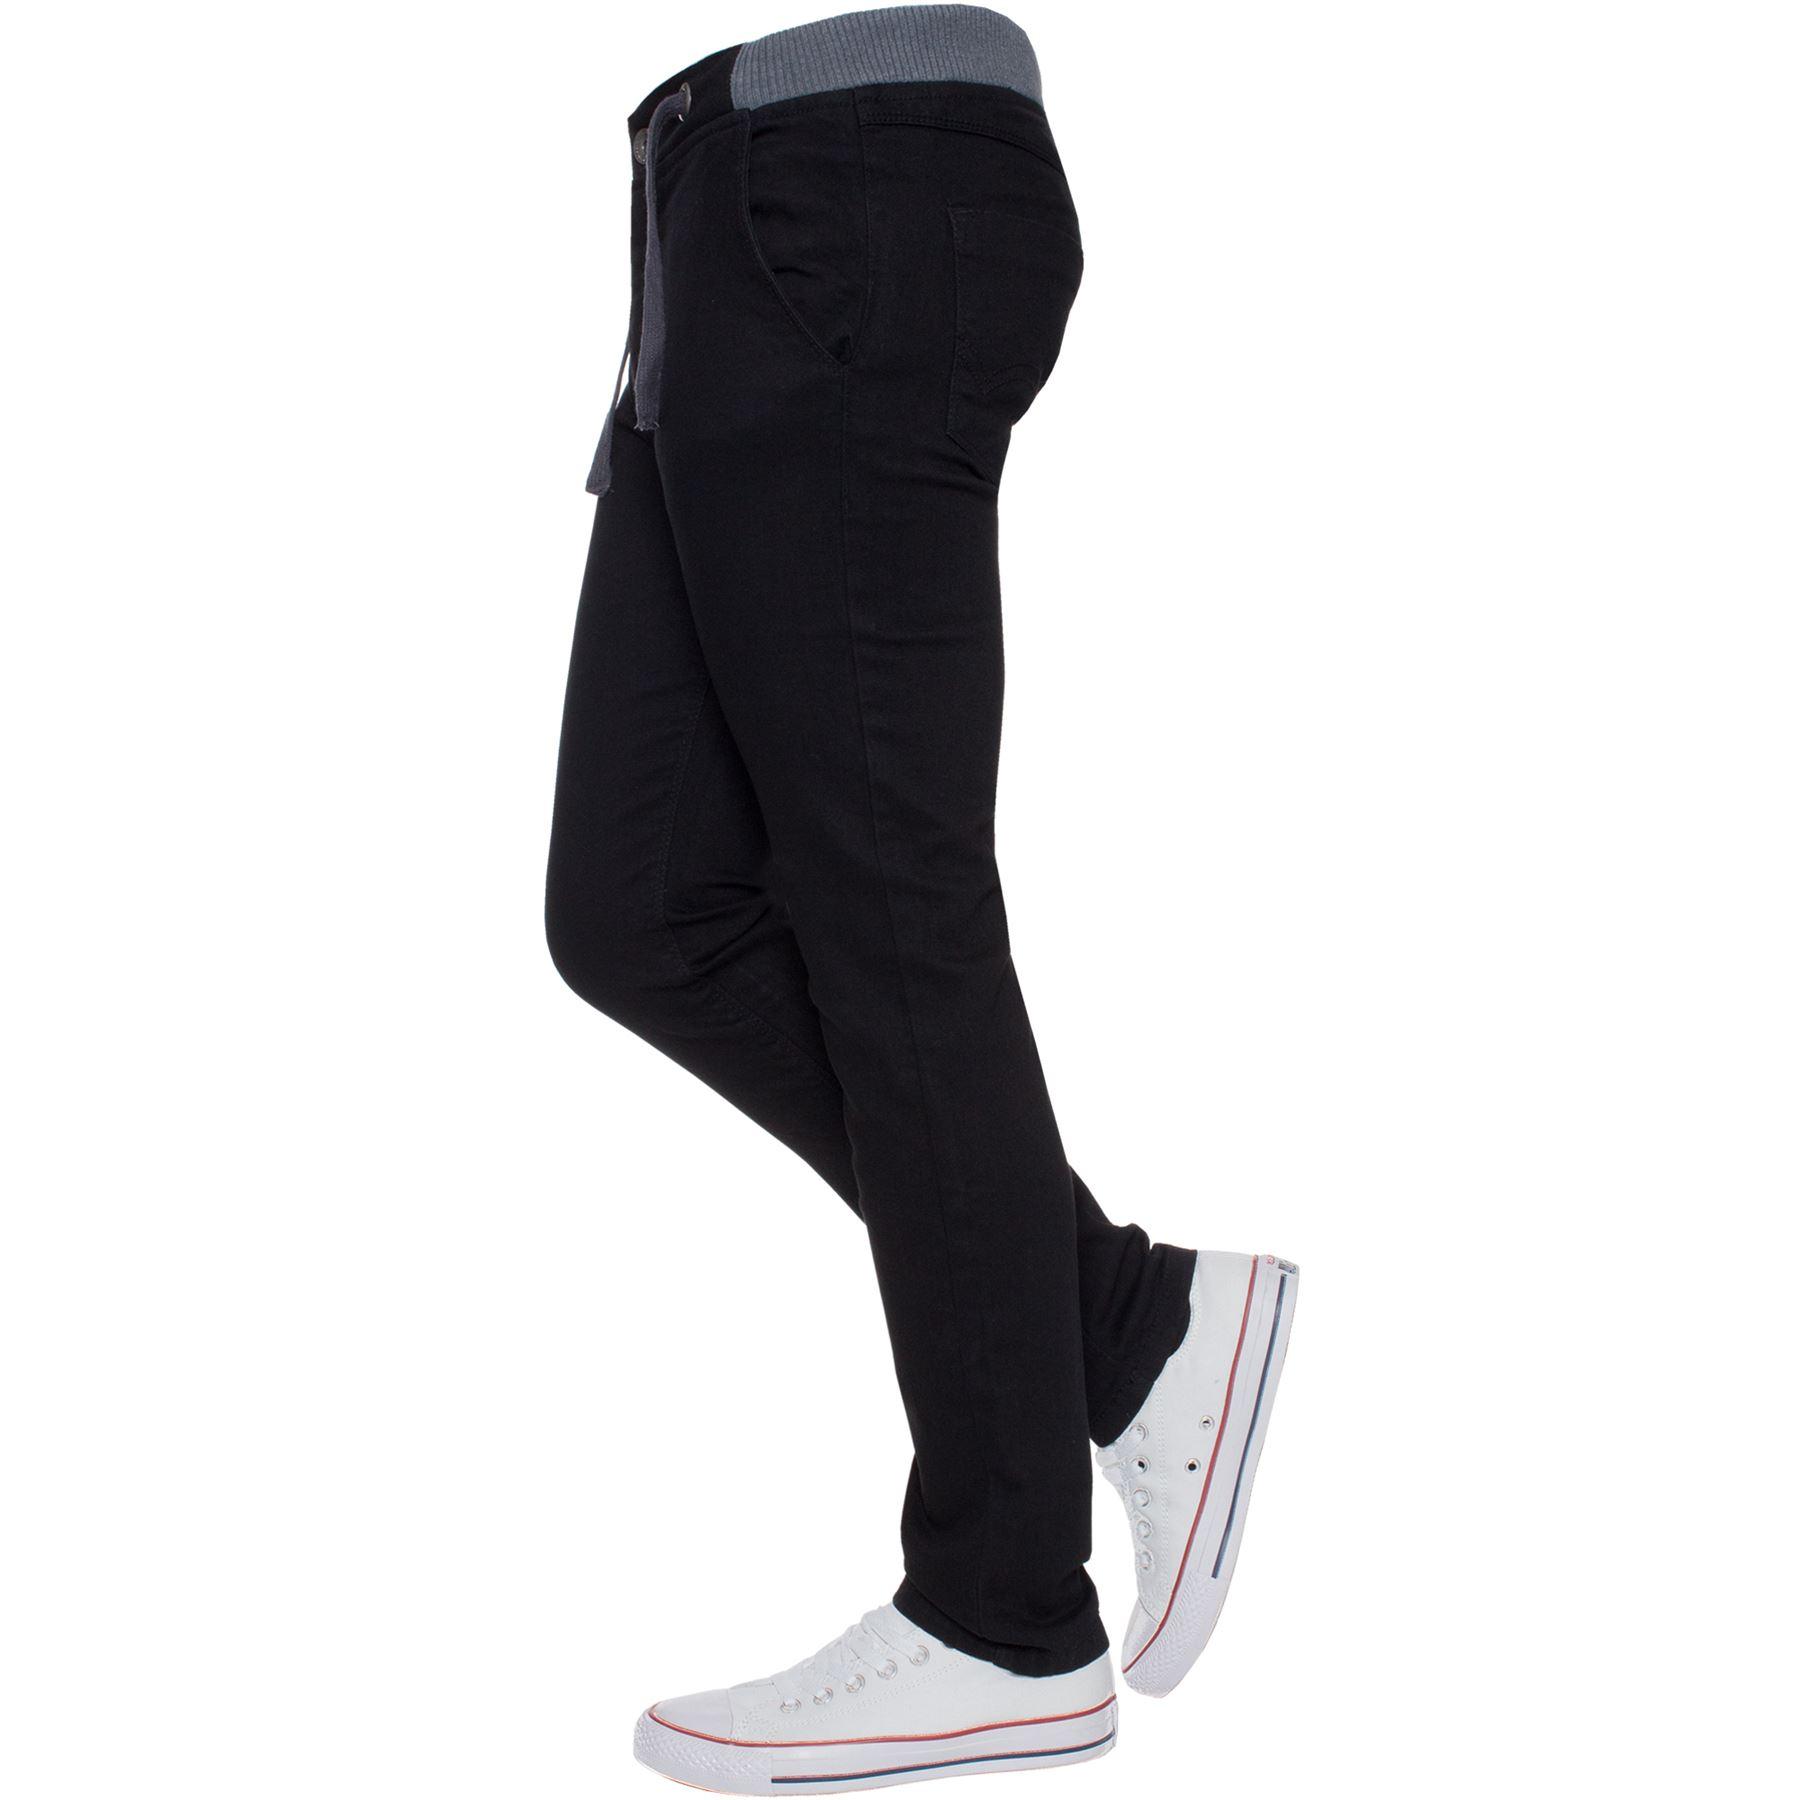 Jean-Garcon-Taille-Elastique-Enfants-Skinny-Stretch-School-Denim-Pantalon-Pantalon miniature 4